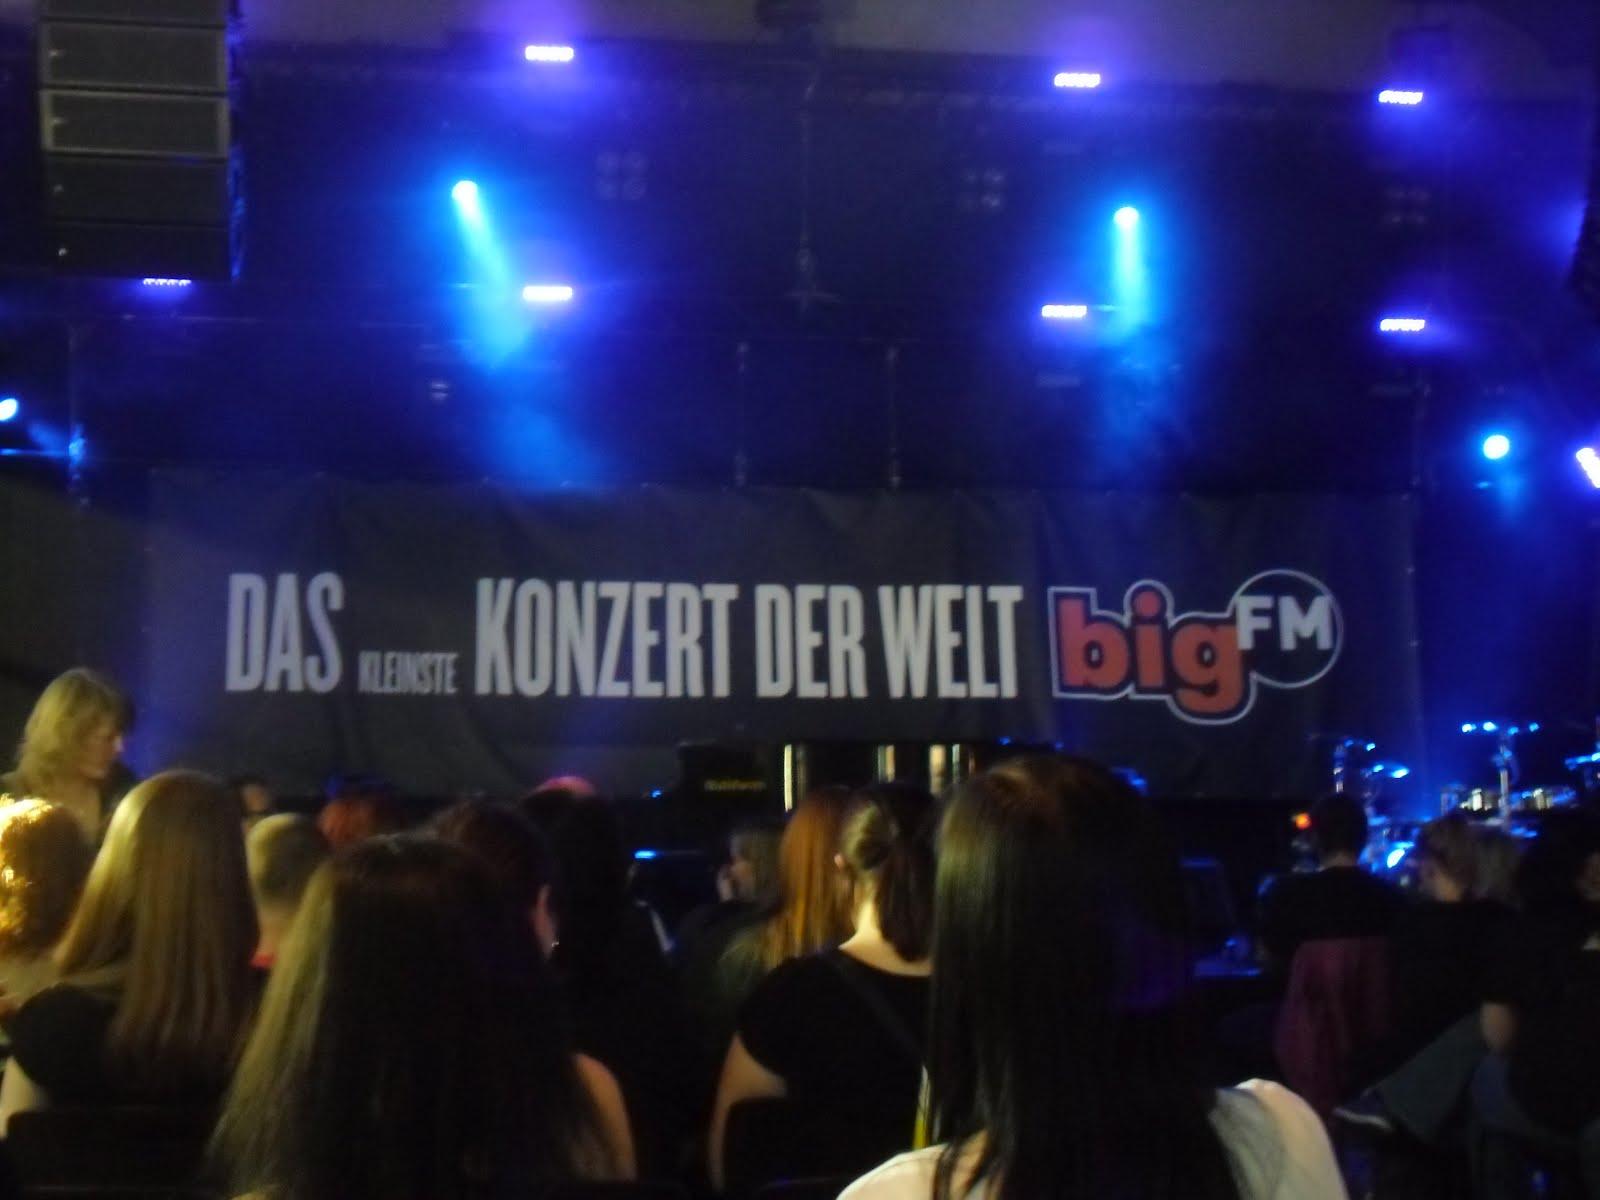 [Mitten im Leben] Evanescence live in Concert (Acoustic)